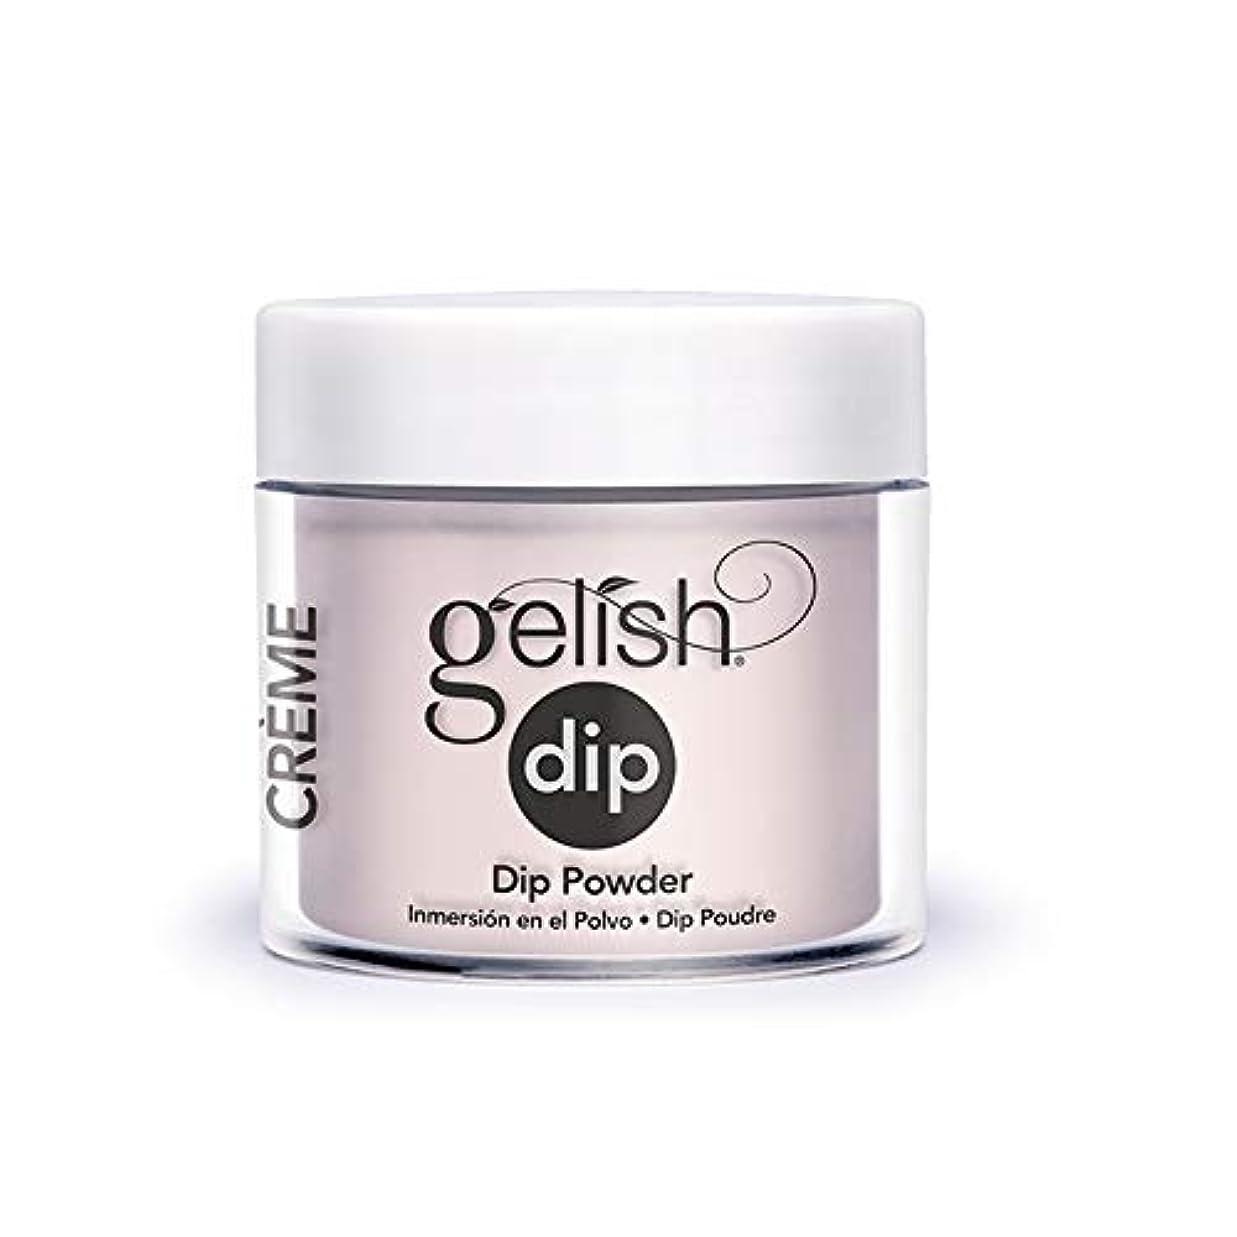 Harmony Gelish - Acrylic Dip Powder - Simply Irresistible - 23g / 0.8oz